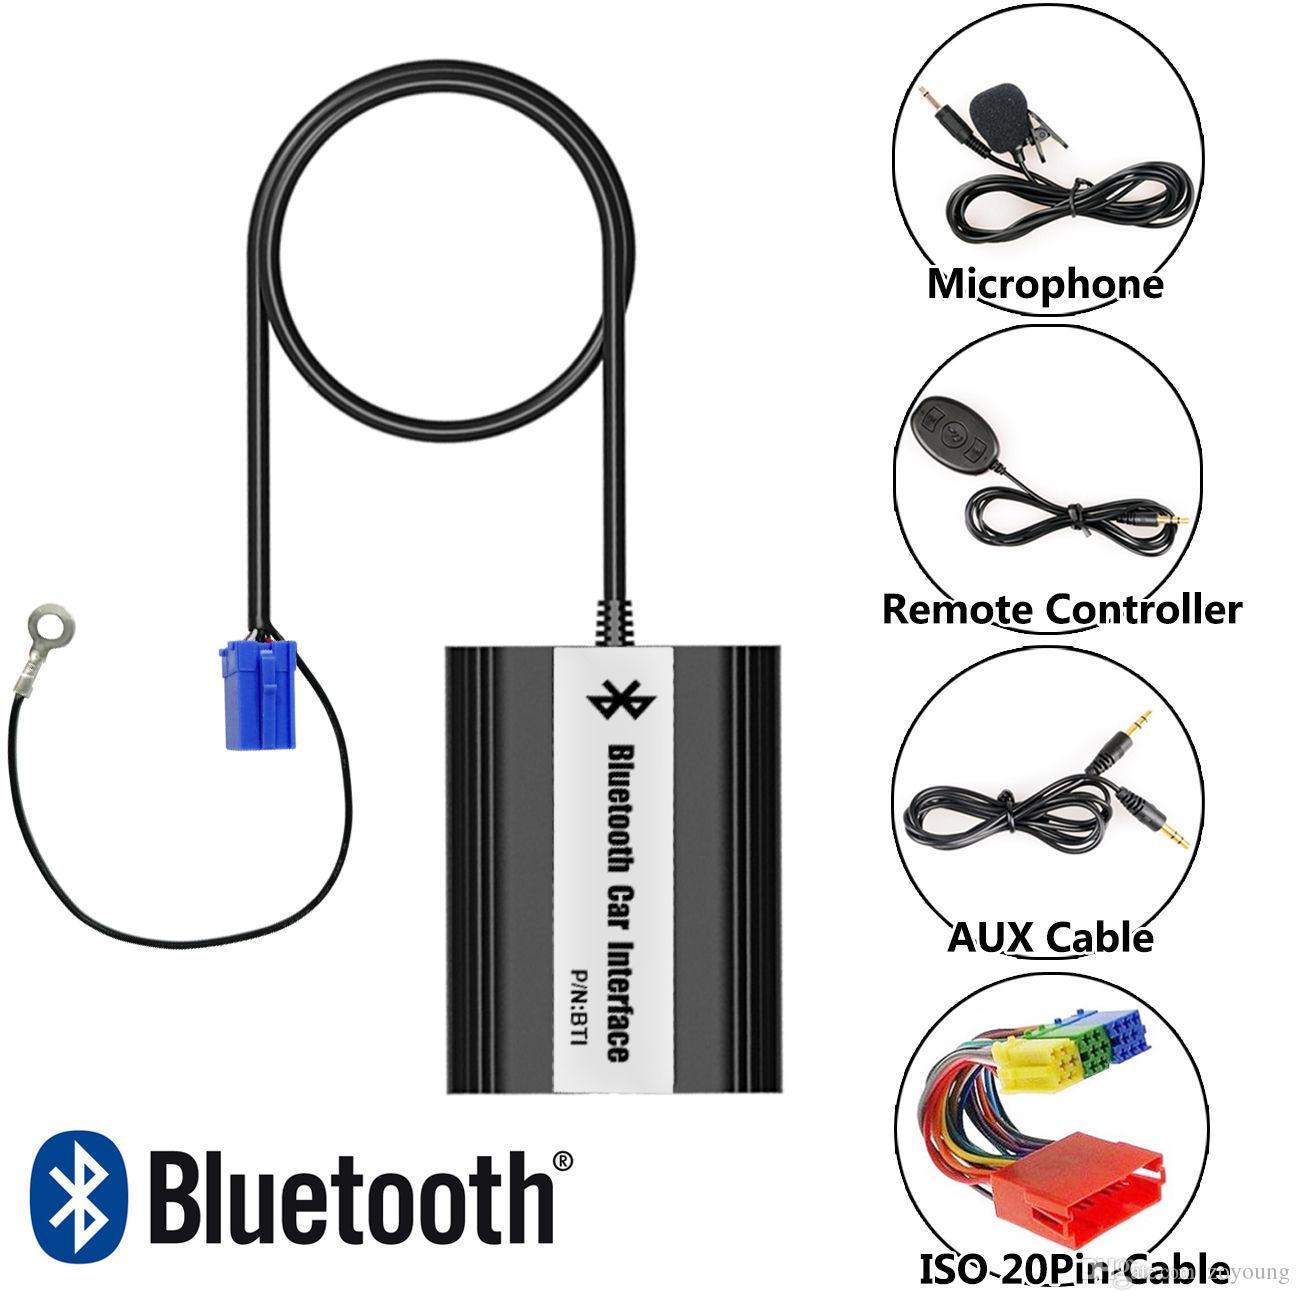 Bluetooth A2DP Handsfree Car Kit USB Flash Drive Car Stereo Adapter  Interface for 1998-2006 Audi A2 A3 A4 A6 A8 TT AllRoad